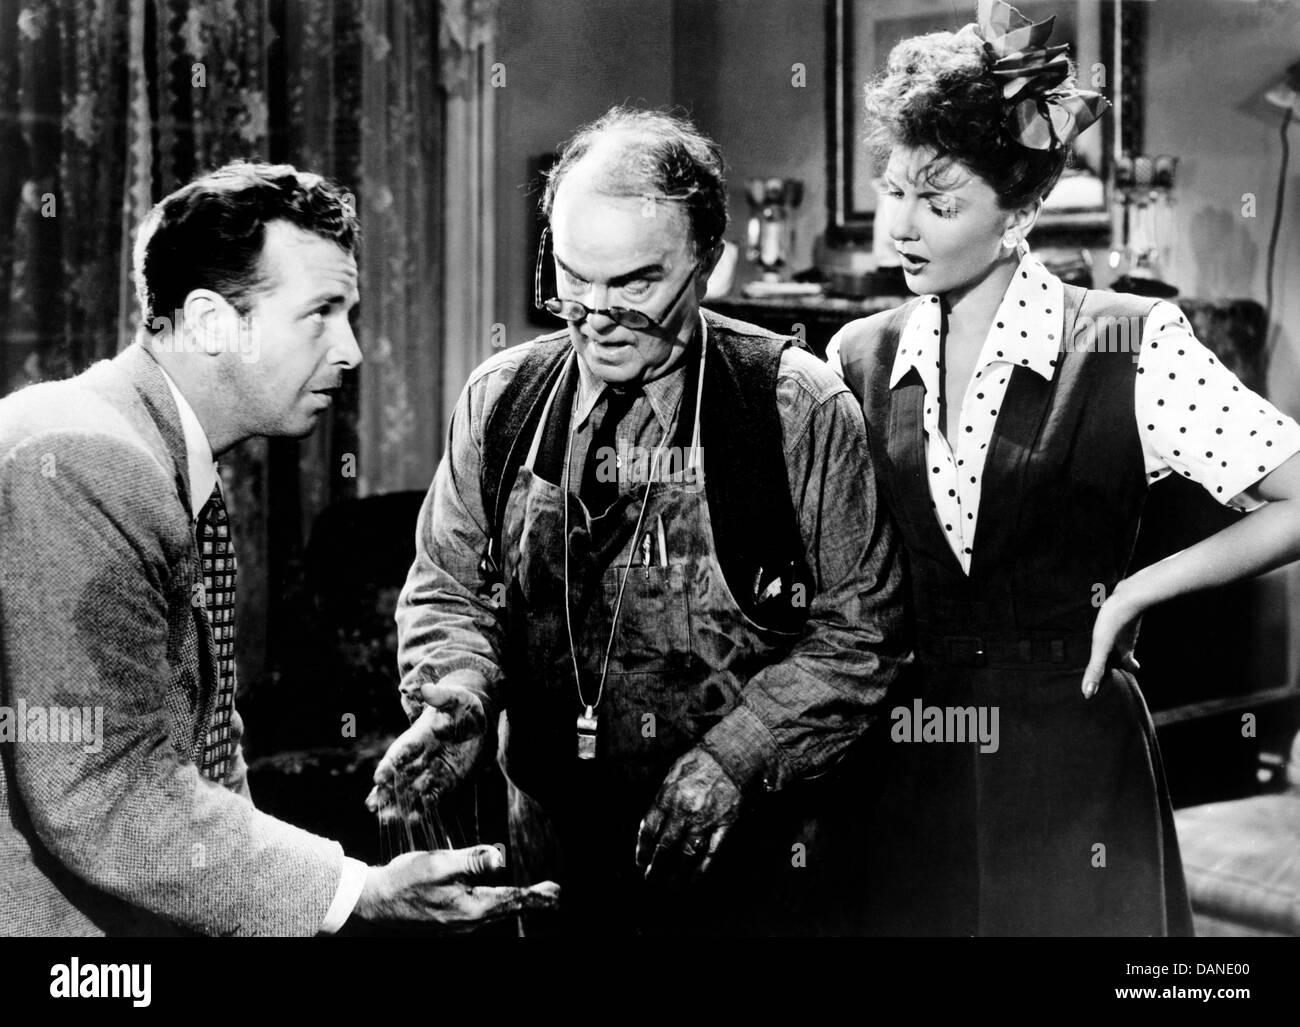 TRUE TO LIFE (1943) GEORGE MARSHALL (DIR) TRTL 001 - Stock Image